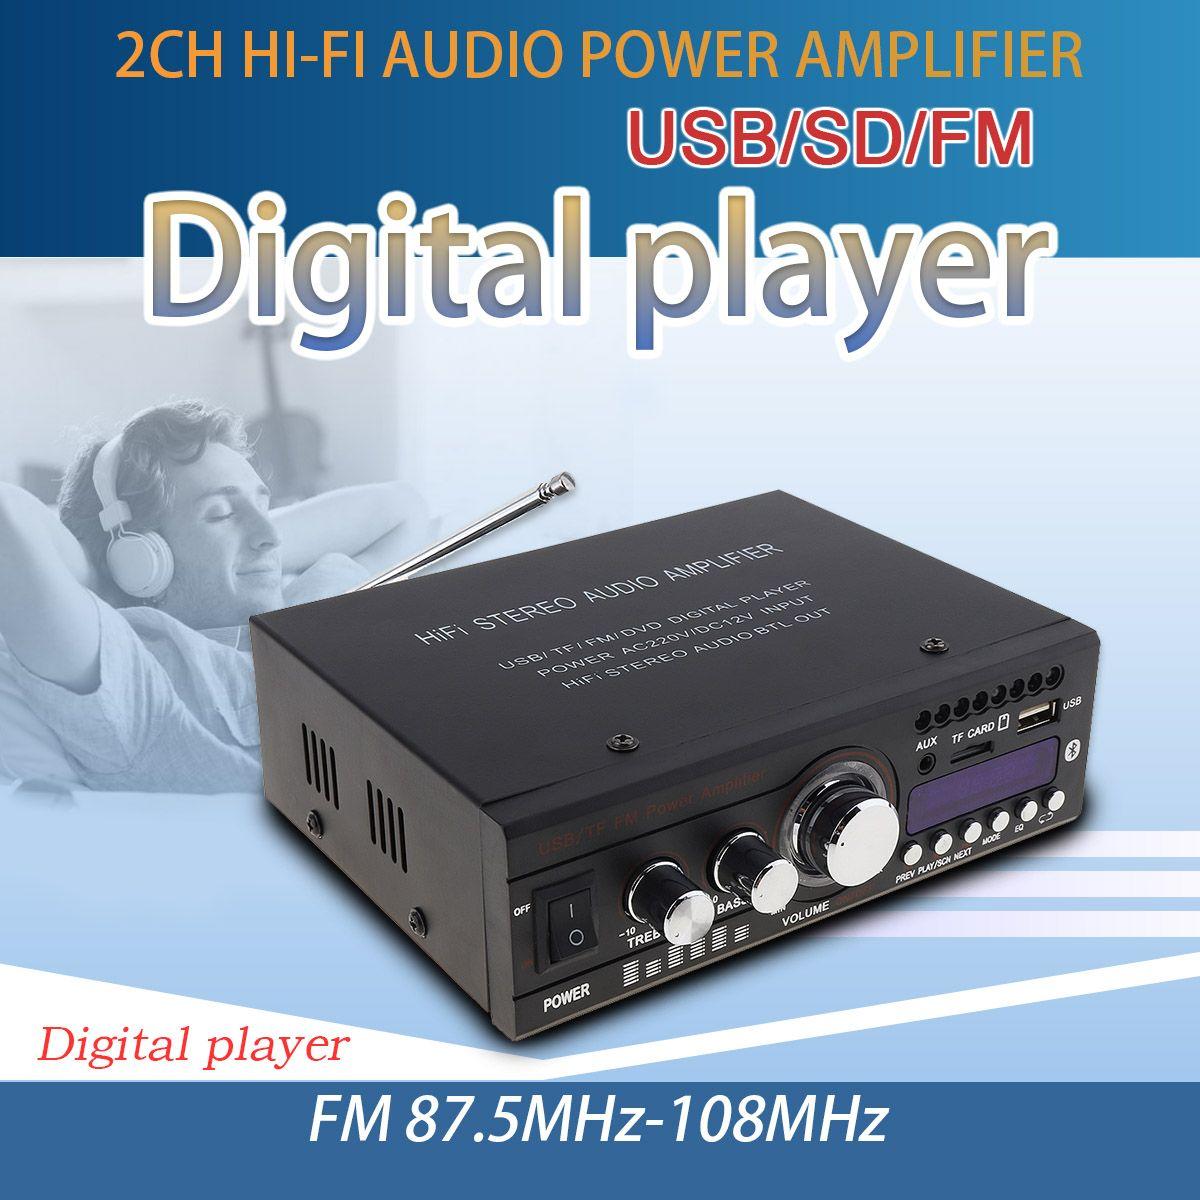 DC 12V / AC 220V Bluetooth 2CH HiFi Car Stereo Audio Power Amplifier FM Radio Auto Hi-Fi Digital Player Support USB SD FM DVD